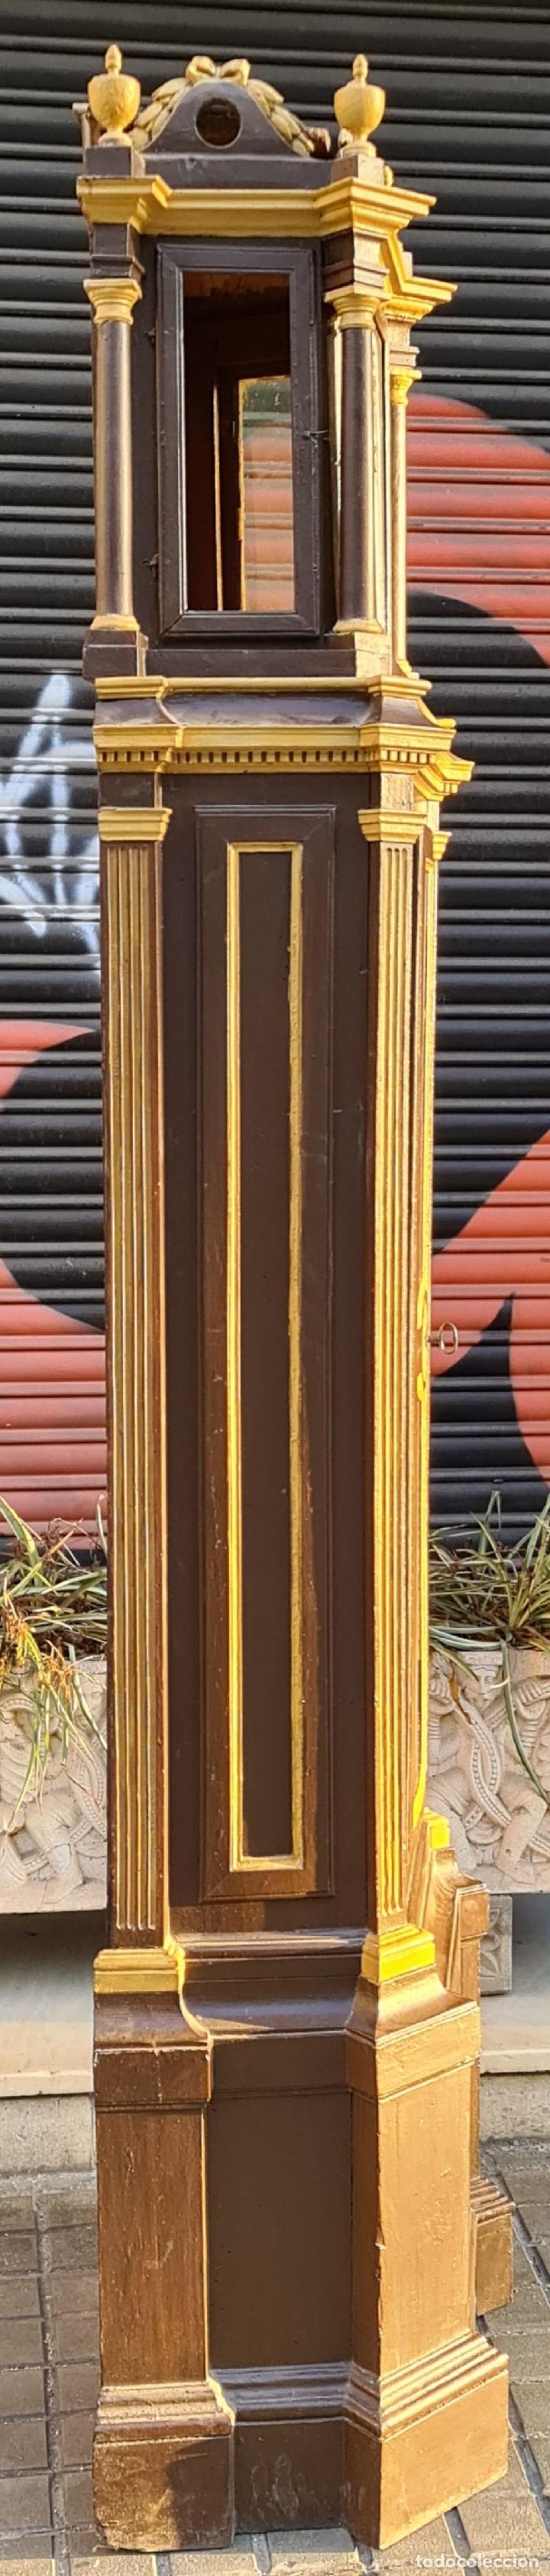 Relojes de pie: MUEBLE PARA RELOJ DE PARED. ESTILO NEOCLÁSICO. MADERA POLICROMADA. SIGLO XVIII-XIX. - Foto 13 - 229494735